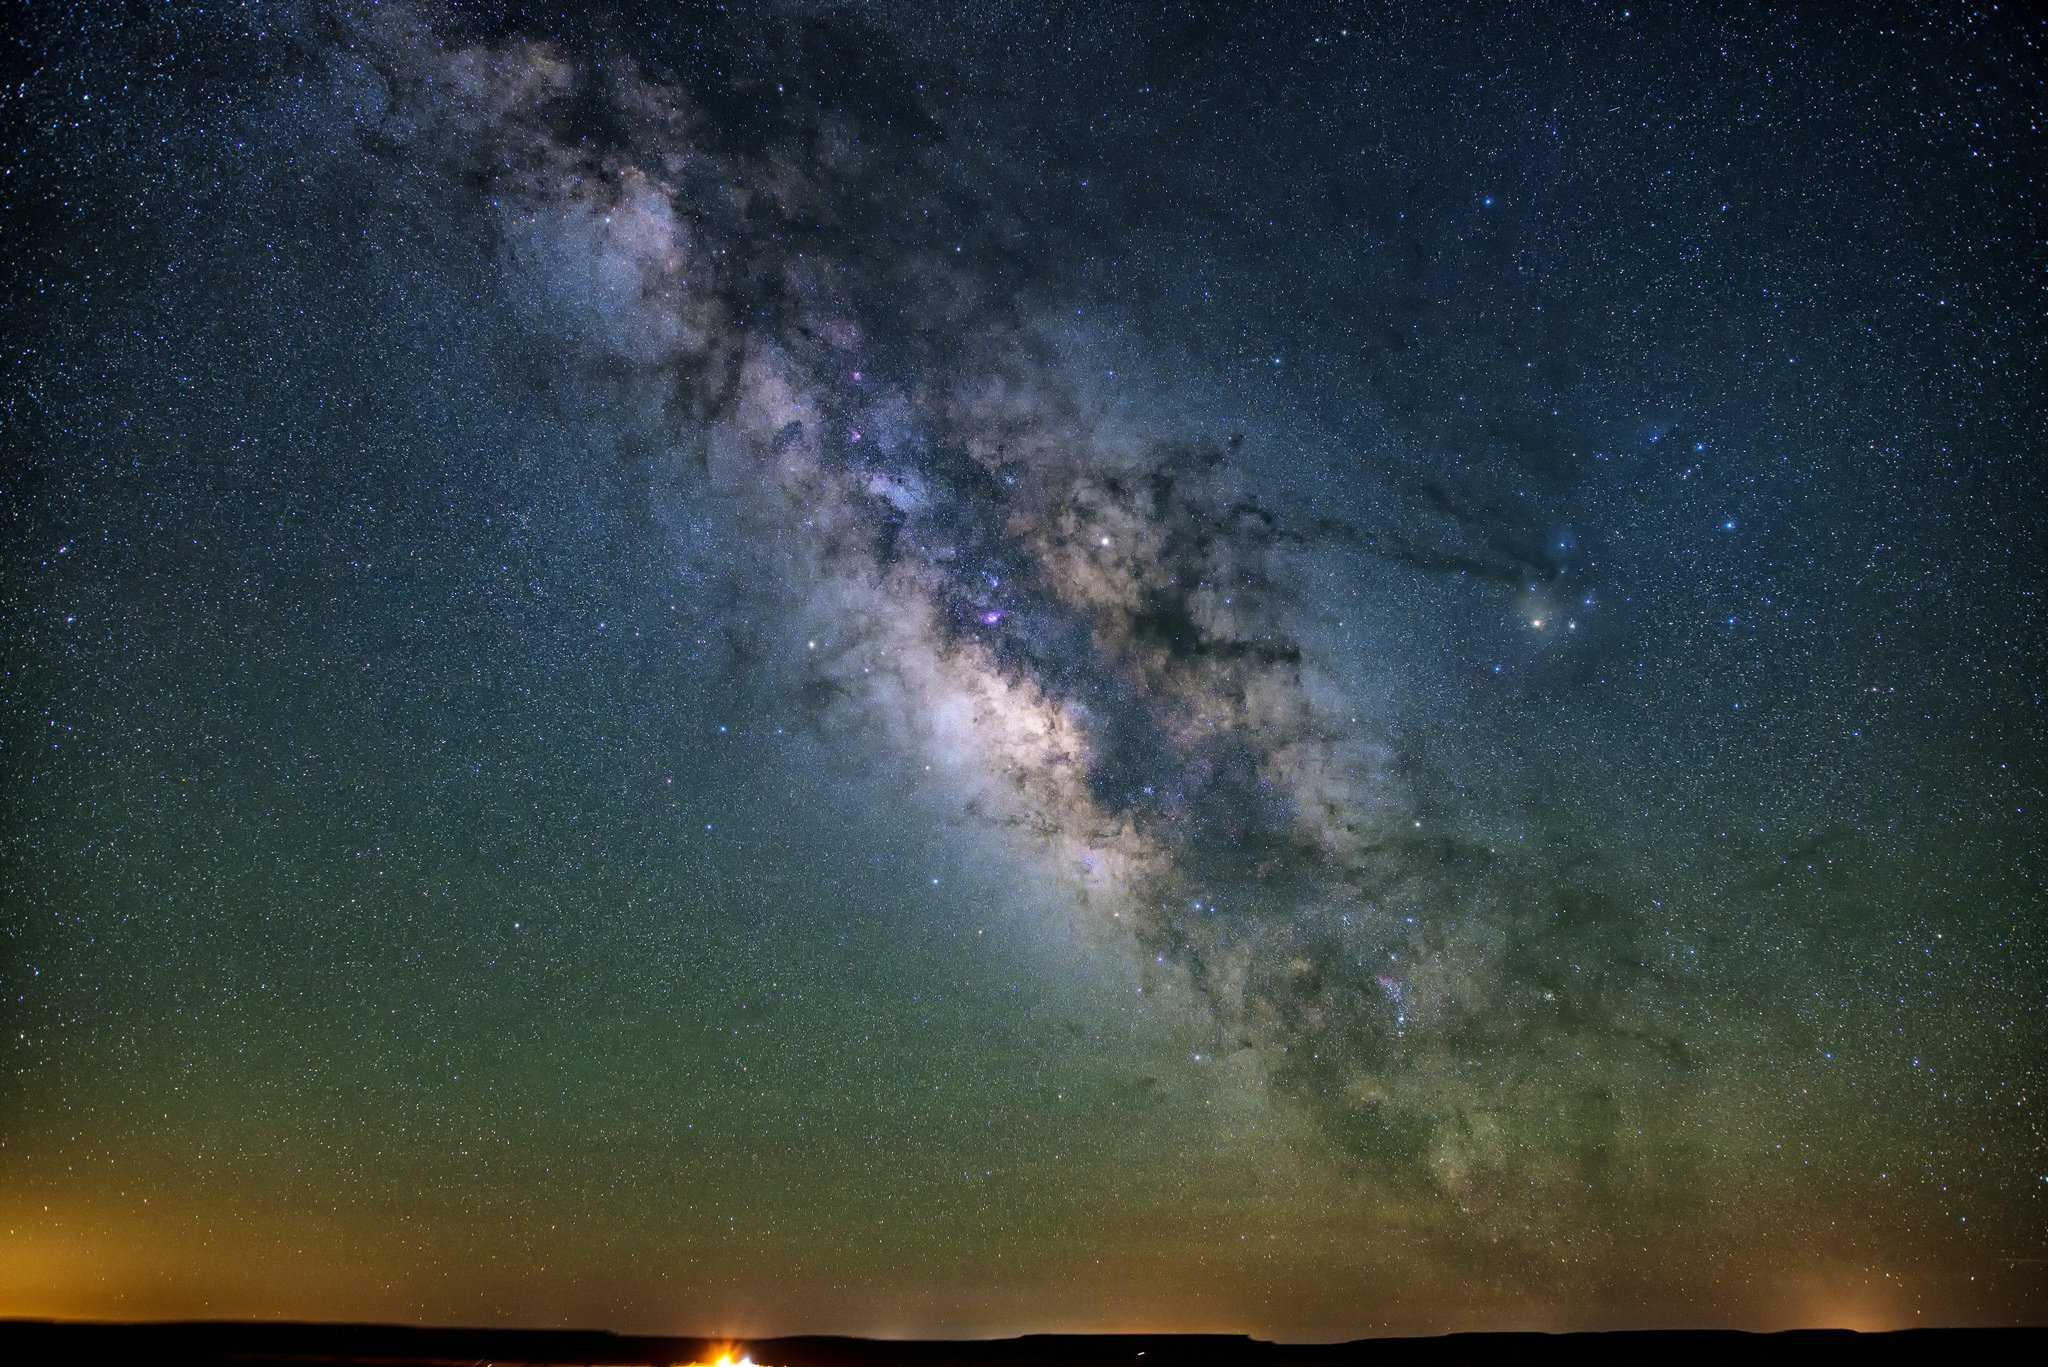 Stargazing near Albuquerque - John Fowler via Flickr 2